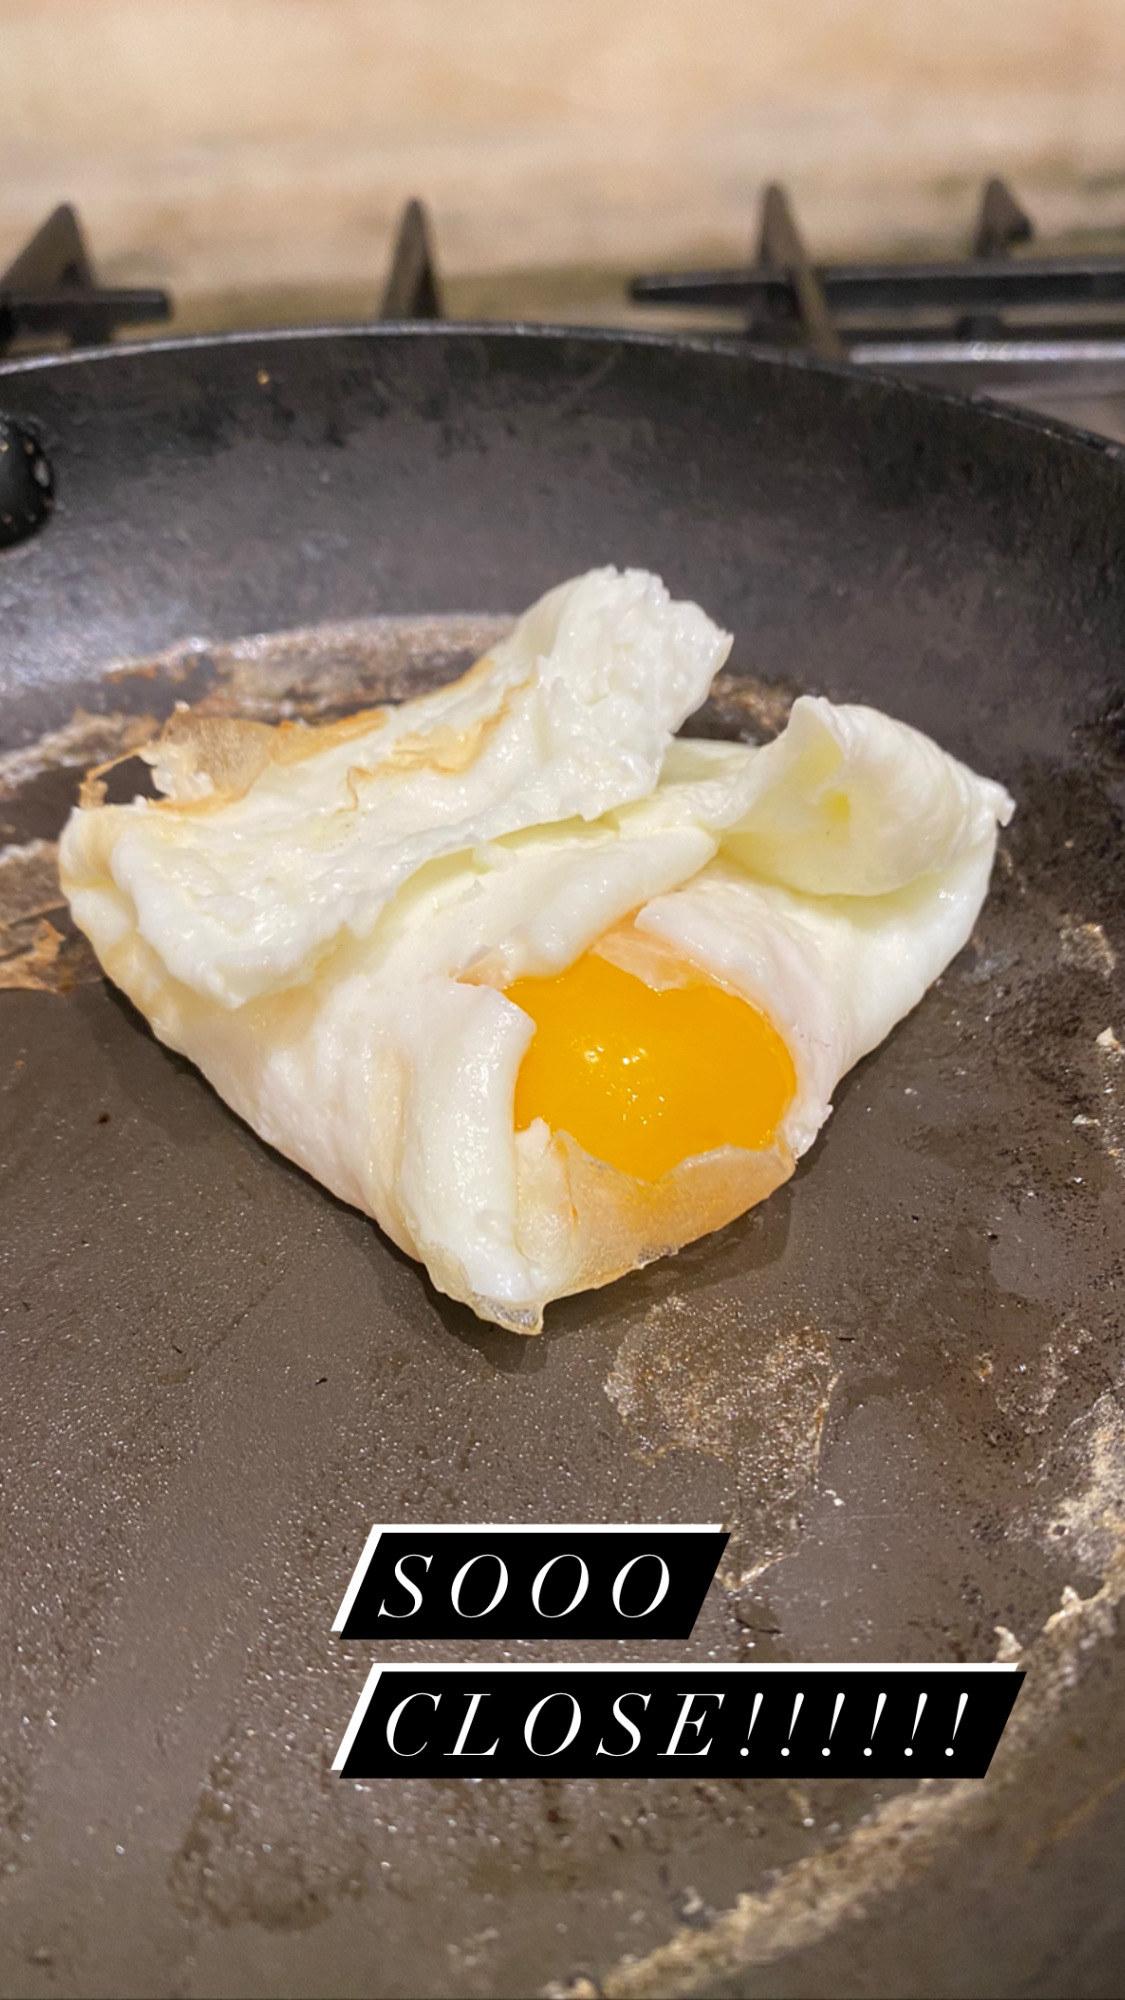 An egg yolk falling out of the egg white envelope.